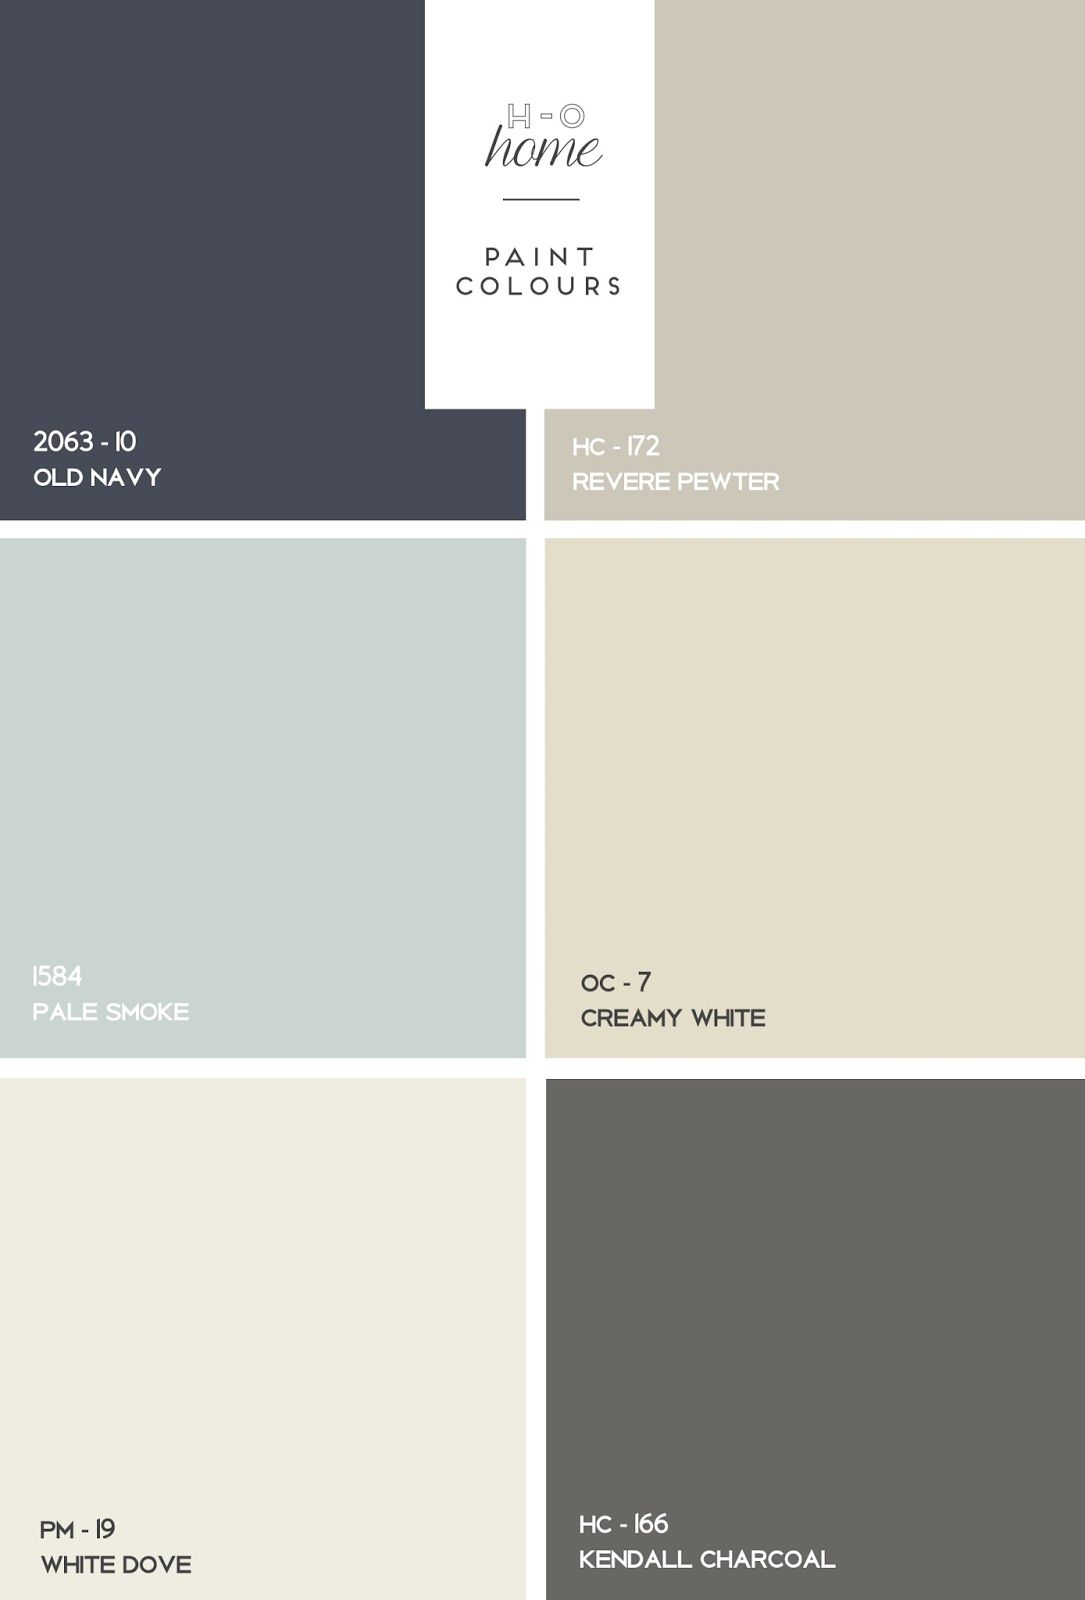 Whole house colour pallet inspiration pinterest for Good paint color for whole house